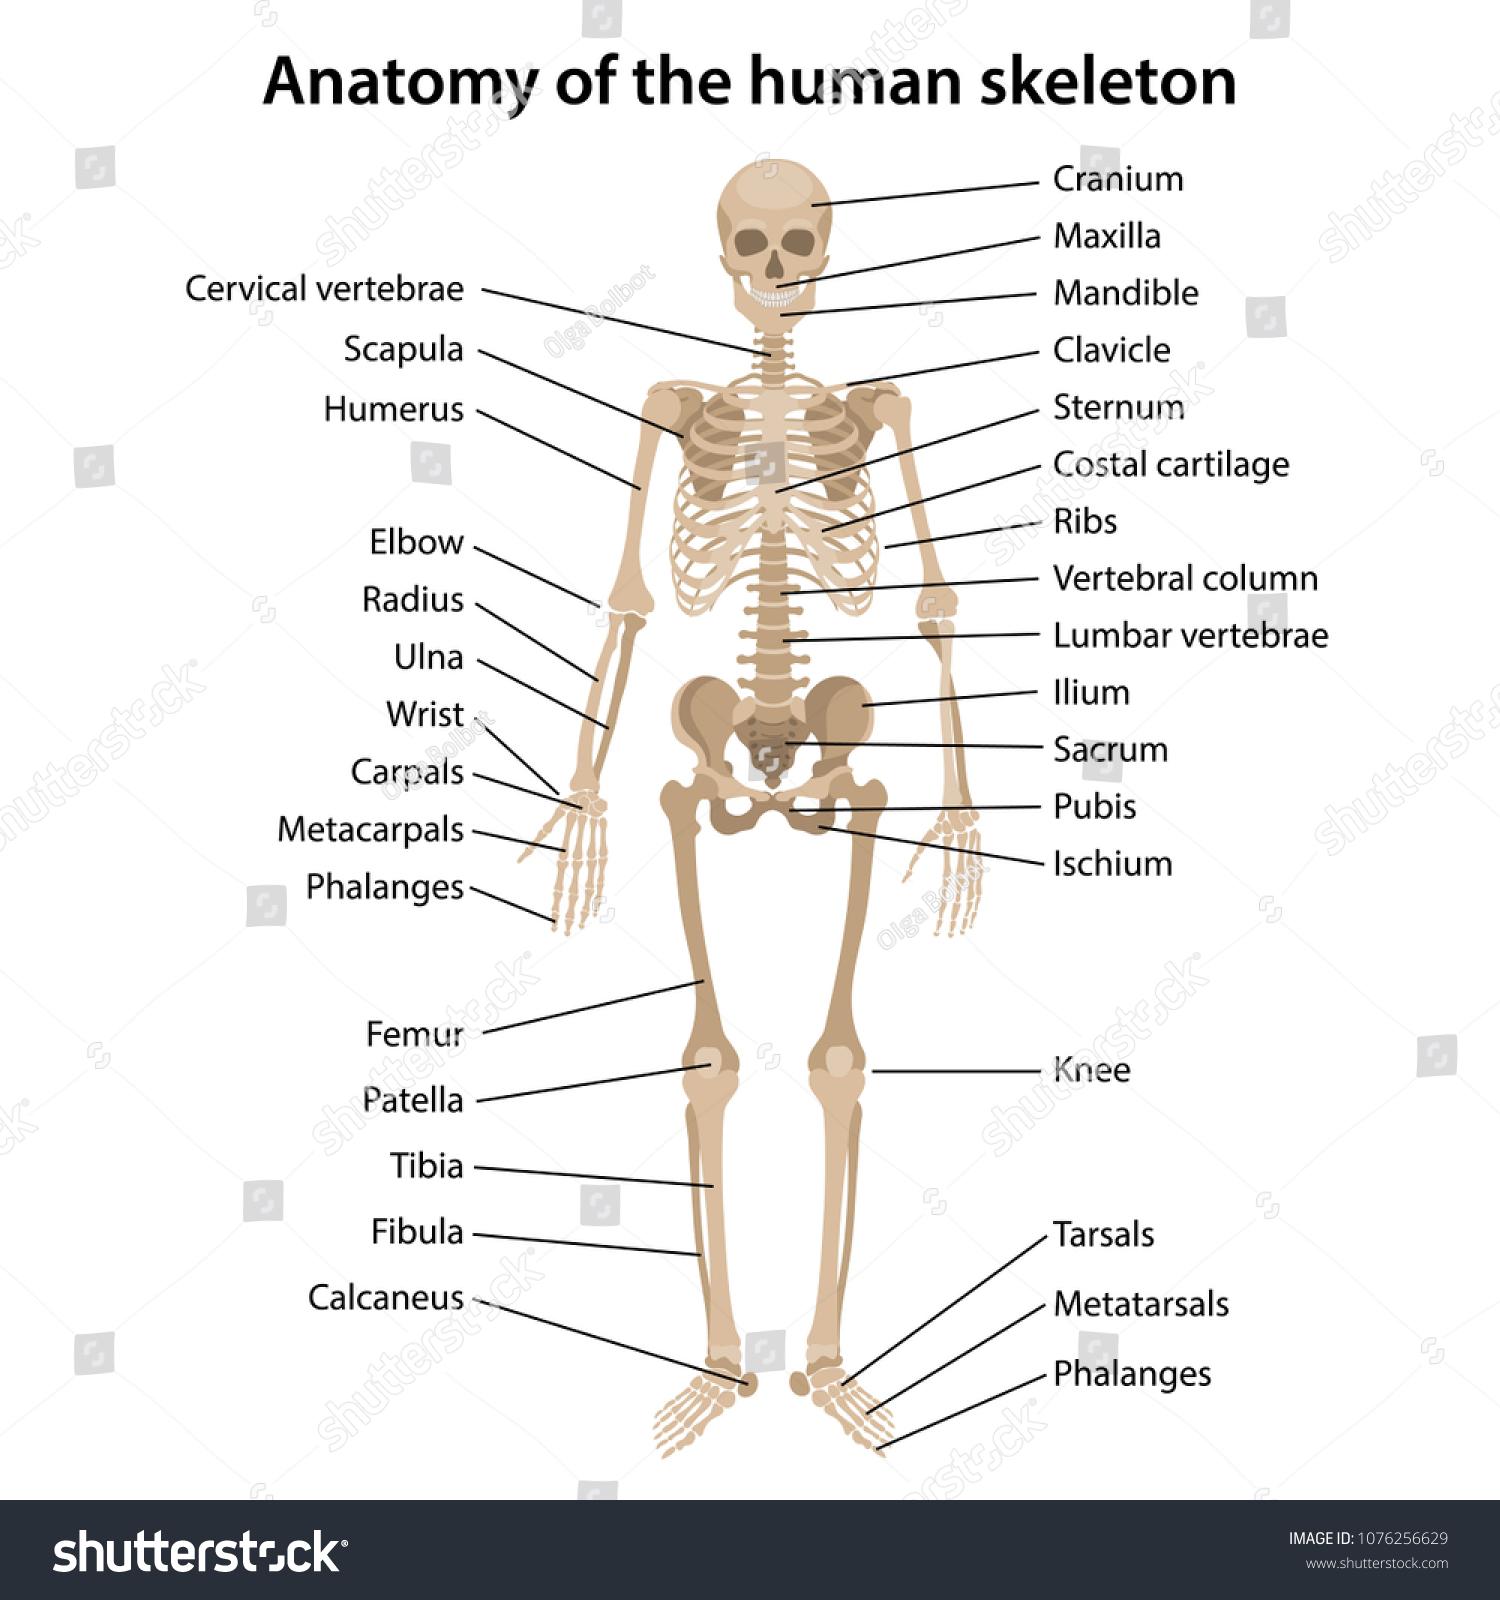 Human Skeleton Diagram Labeled